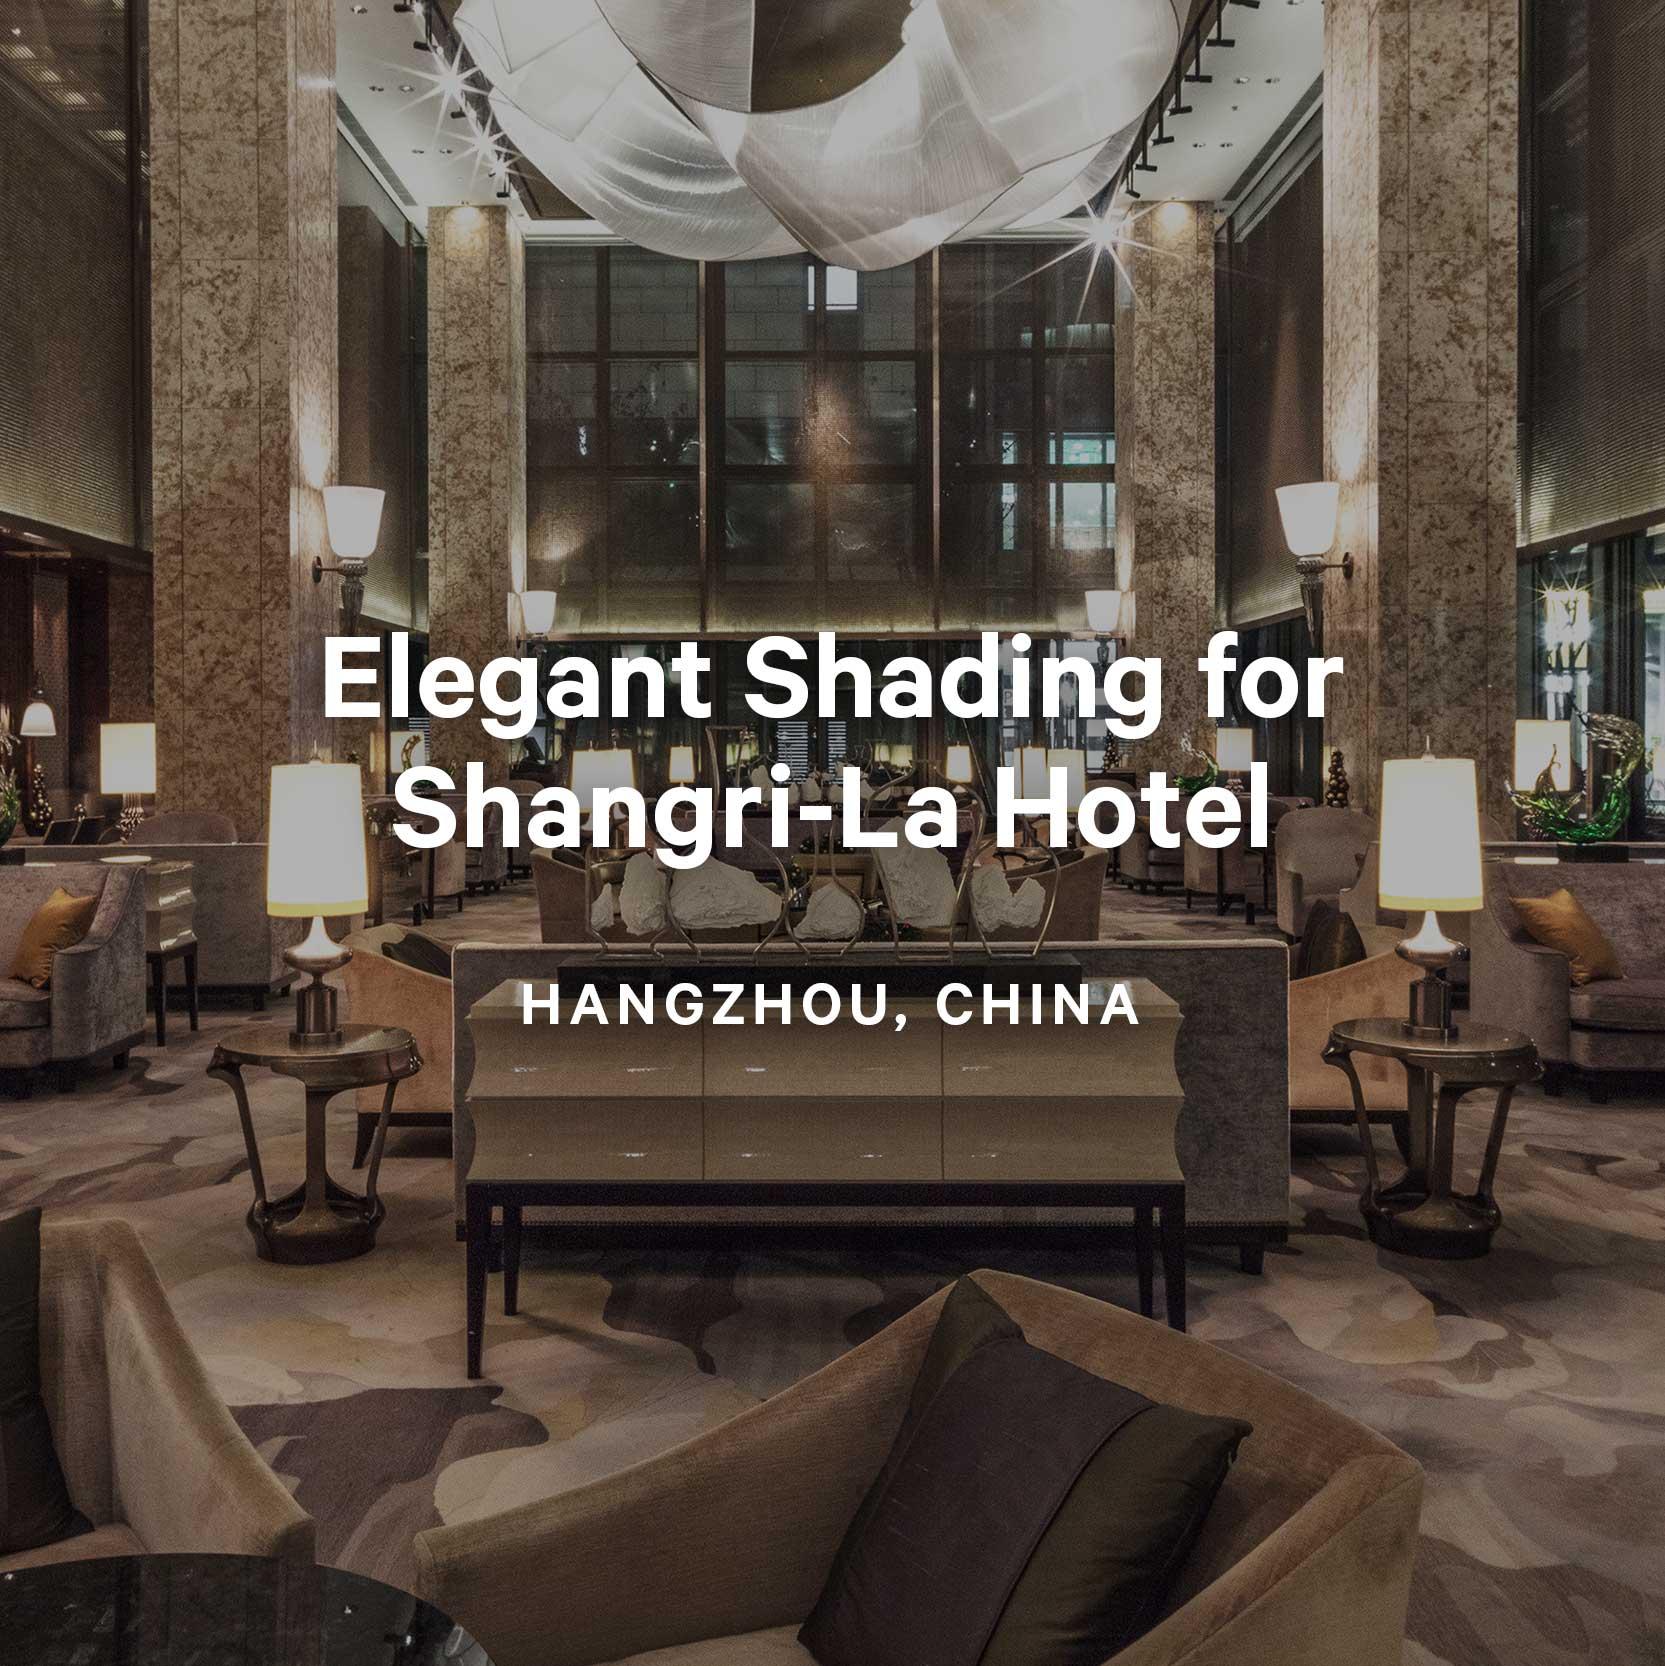 Elegant Shading for Opulent Hotel